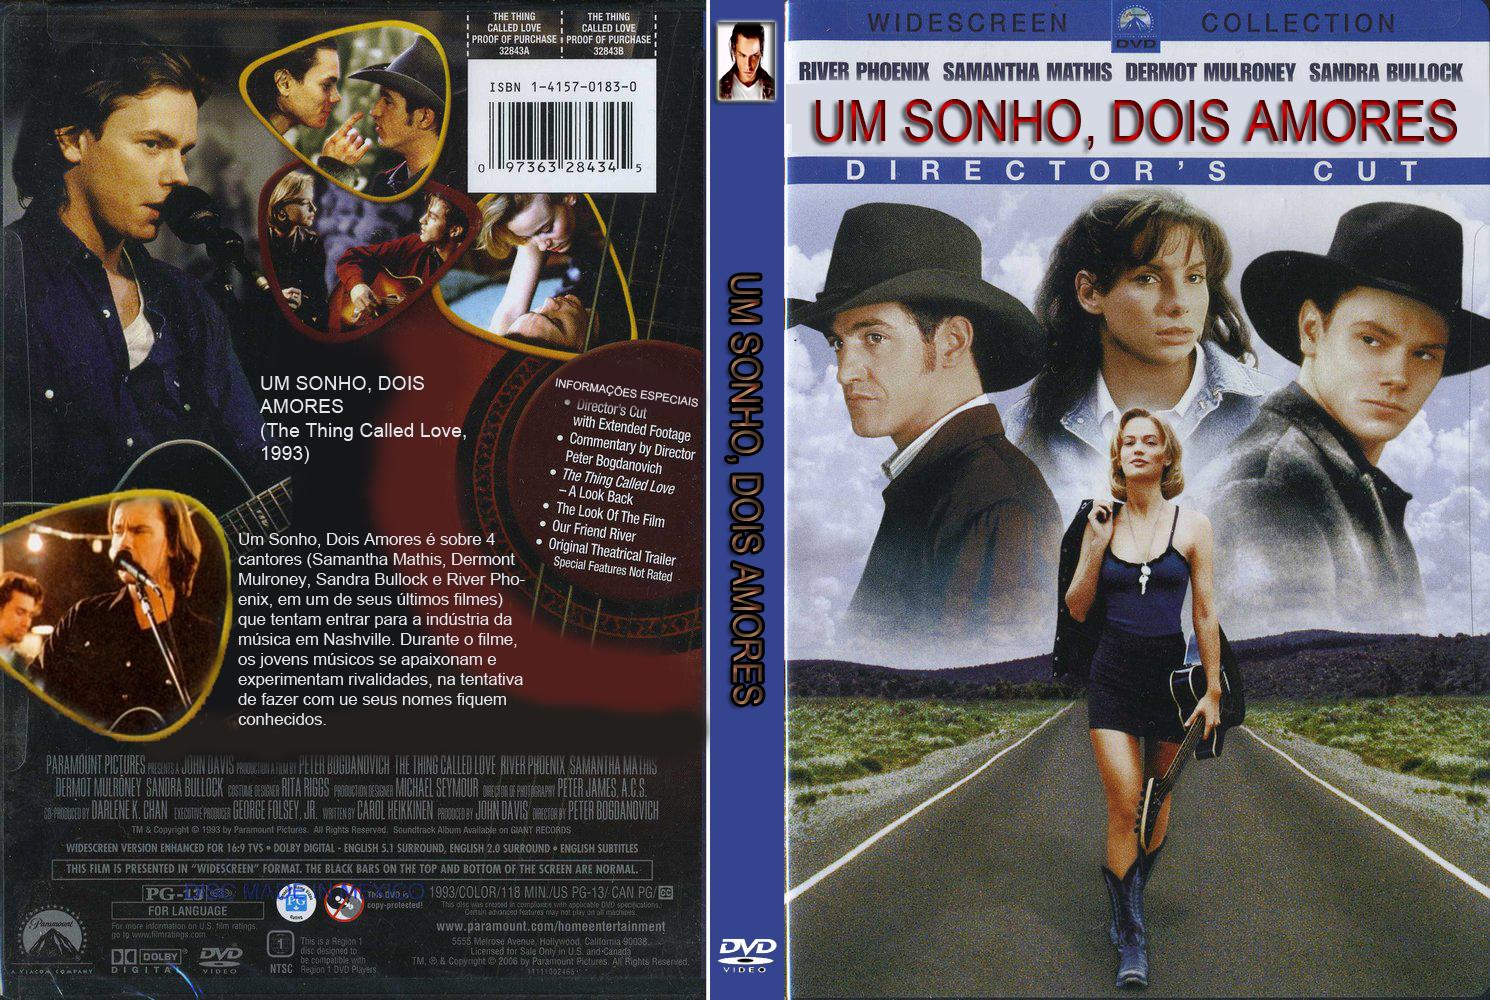 Filmes Sobre Musicos within capas filmes de romance